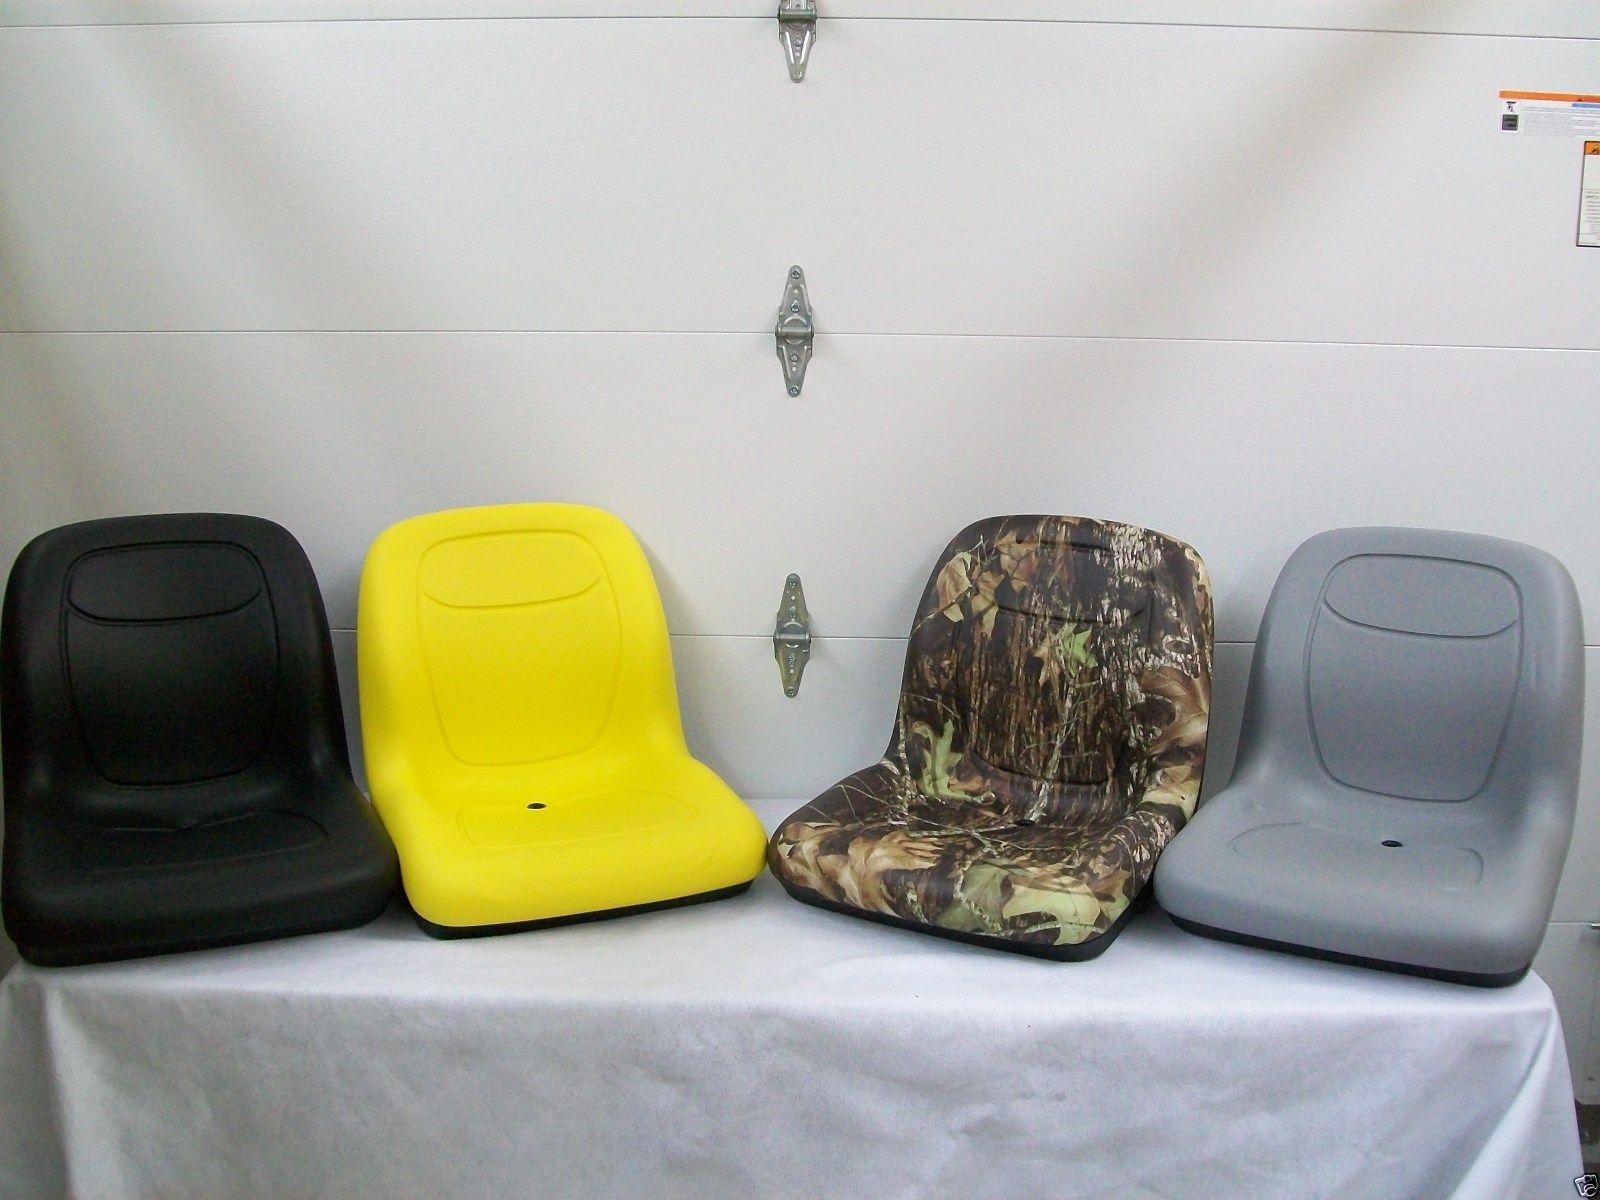 HIGH-BACK-YELLOWBLACKGRAYCAMO-SEATS-LAWN-MOWERS-GATORS-COMPACT-TRACTORS-BO-151274015676